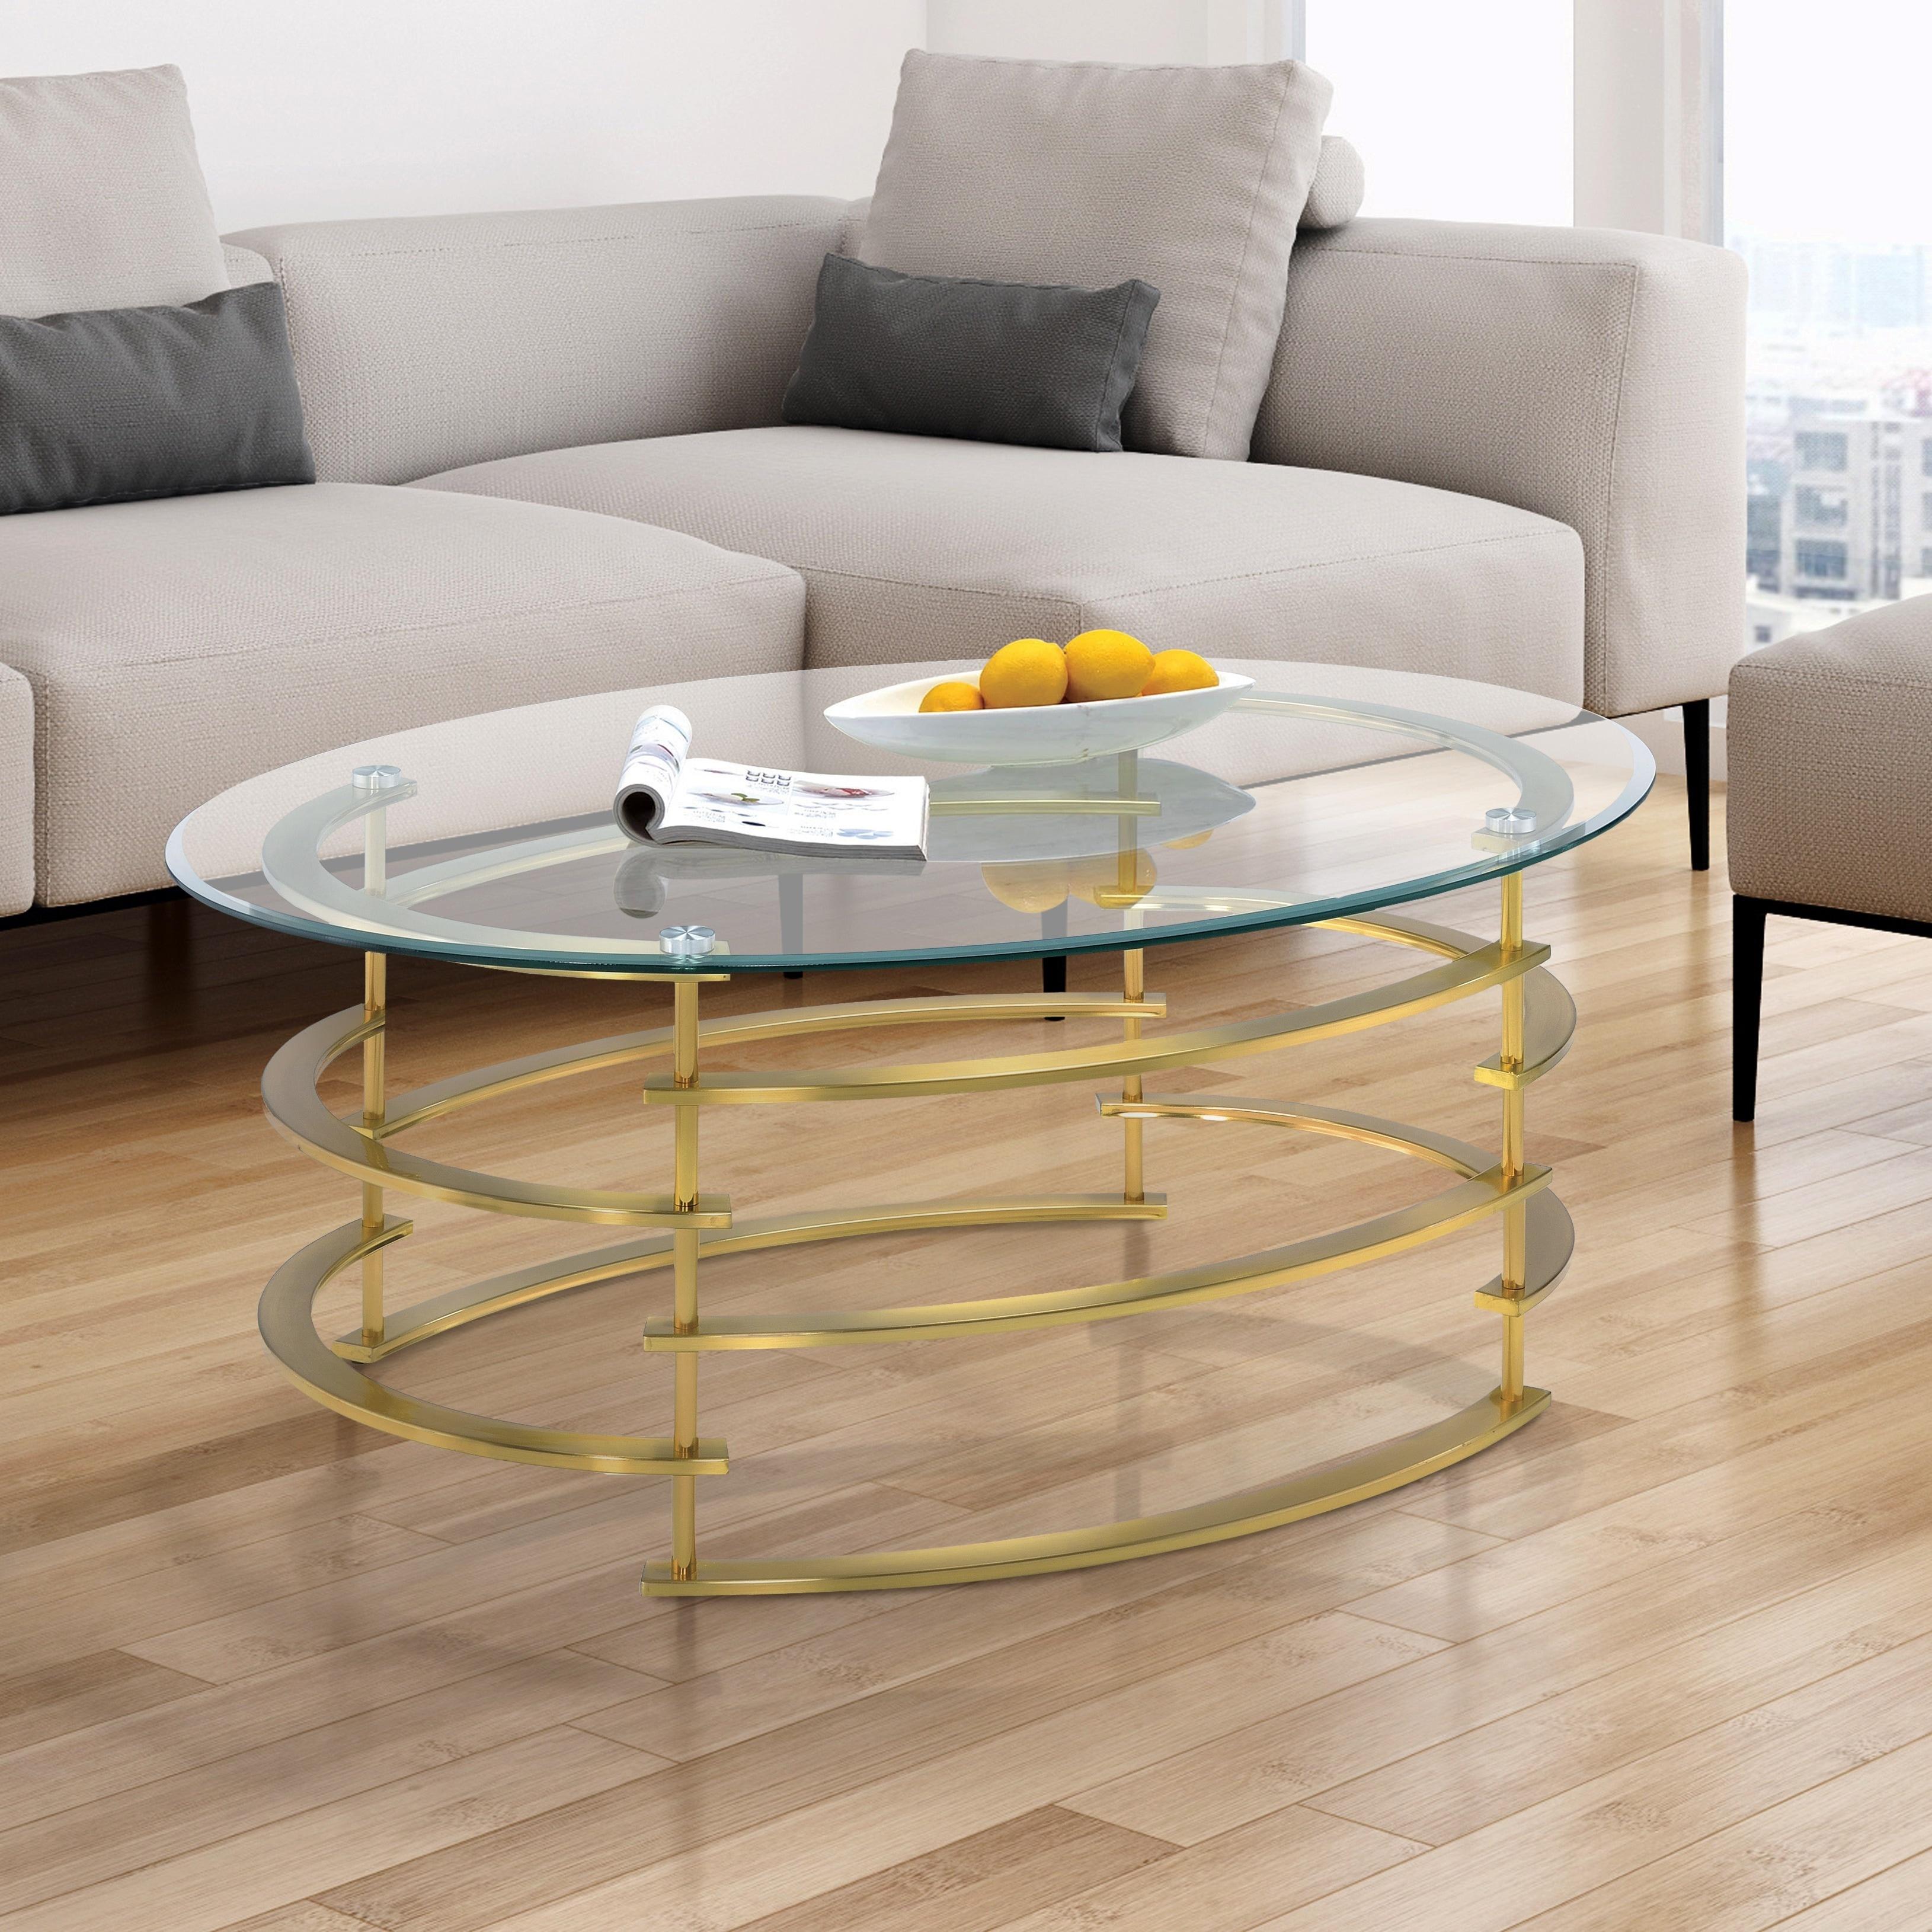 Furniture of America Odella Contemporary Glam Glass Top C...